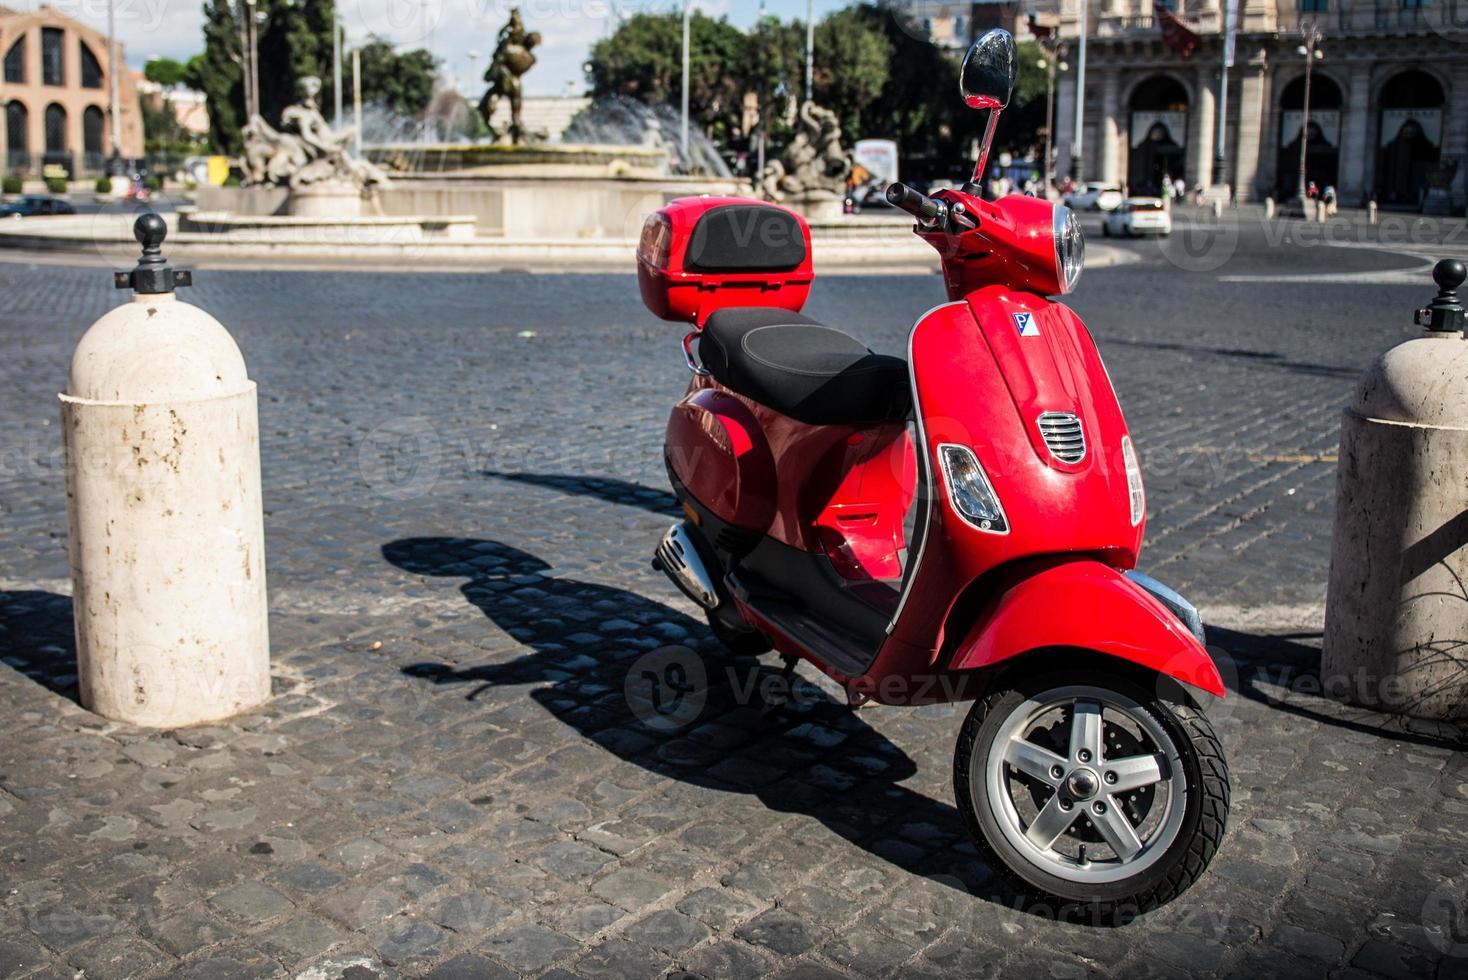 skoter på en gata i Rom foto